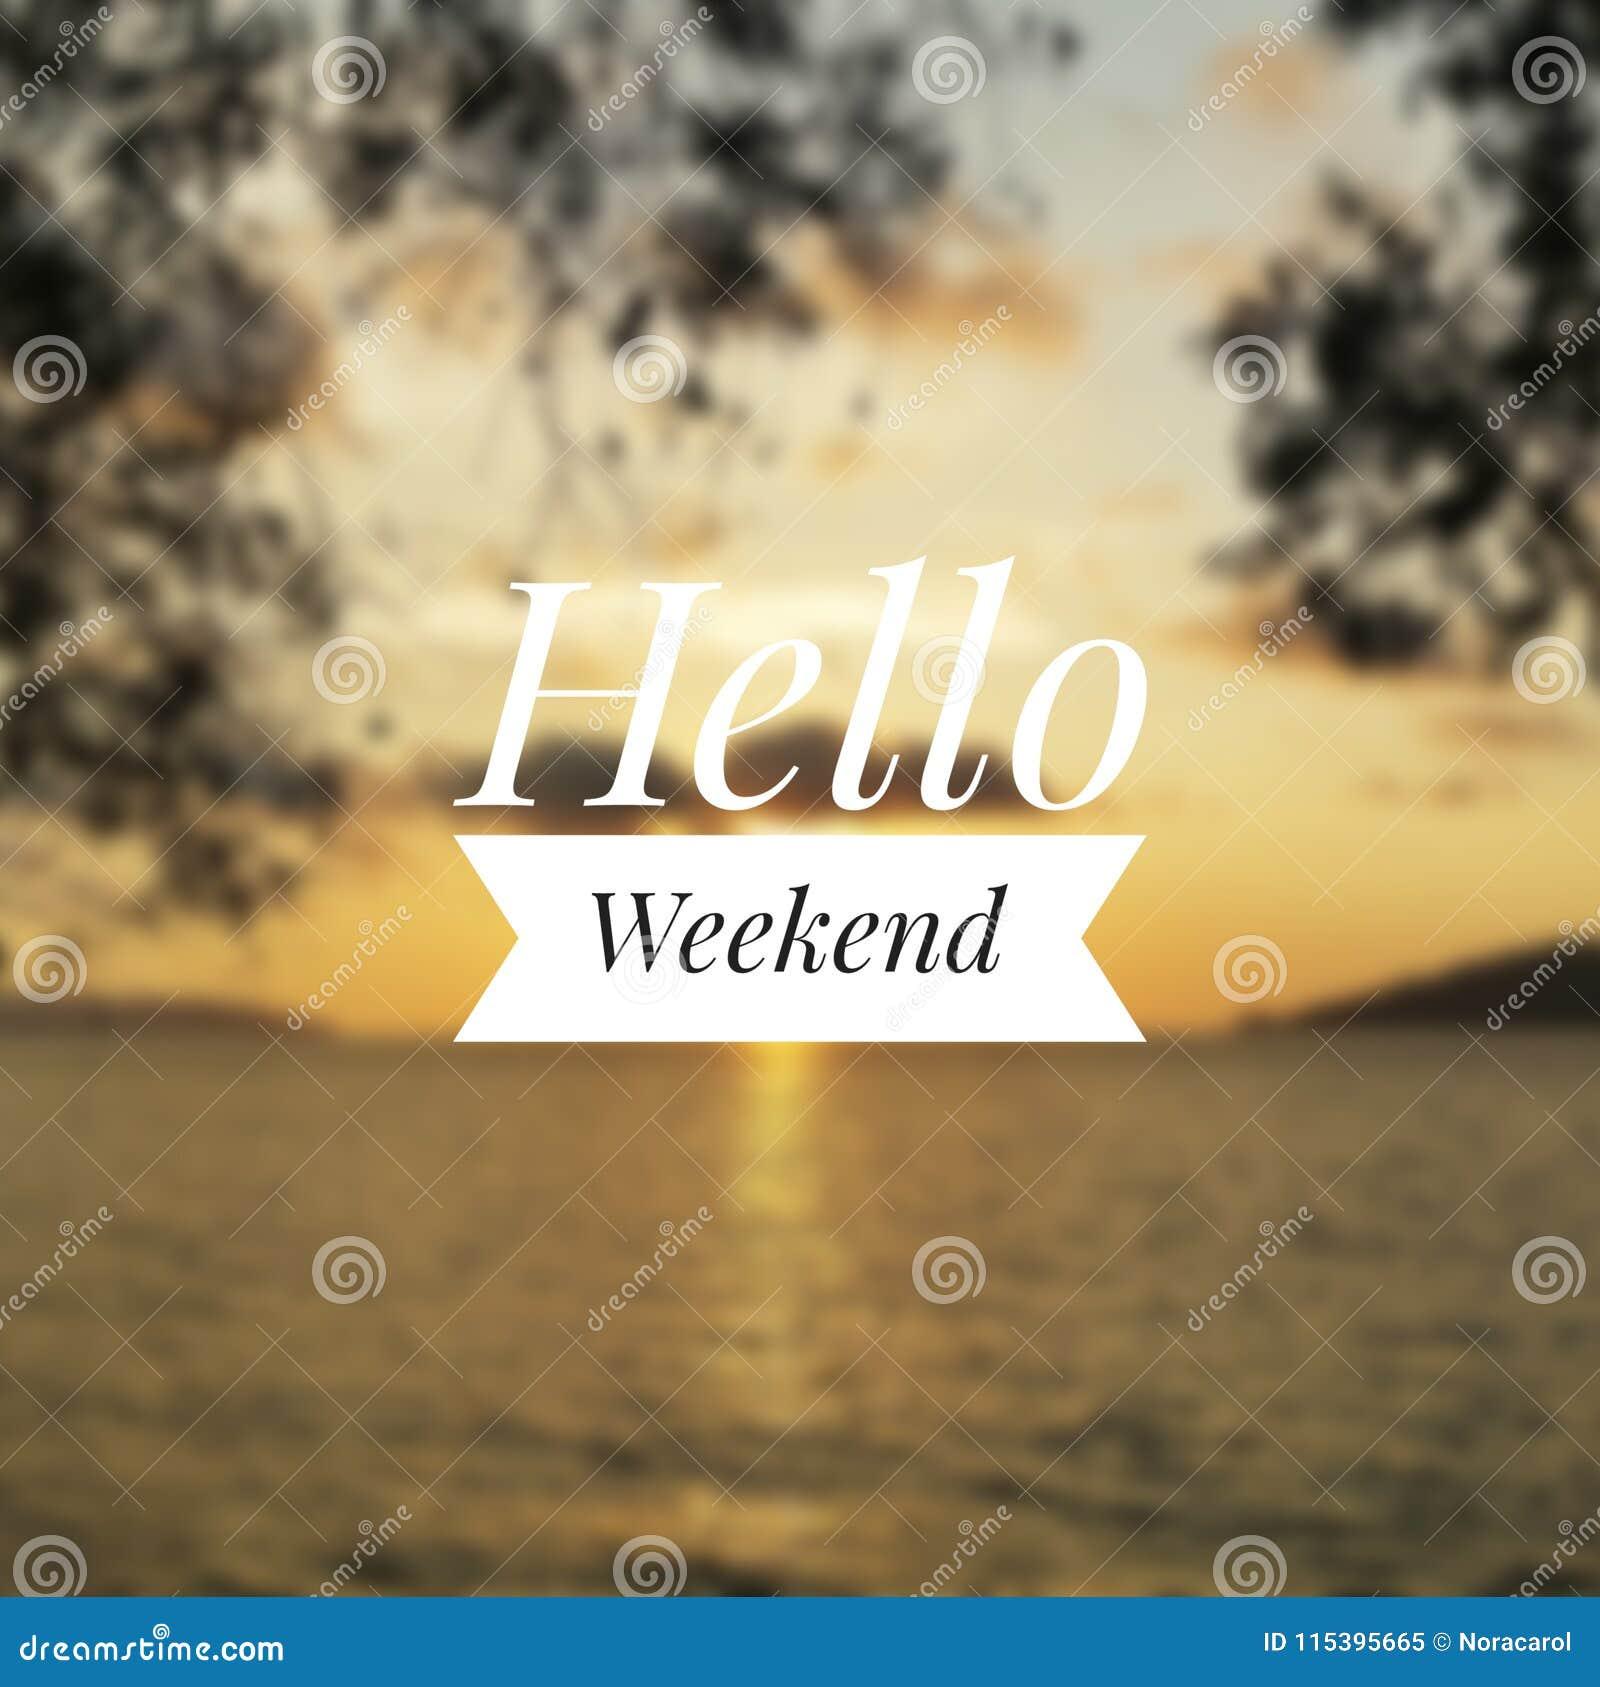 Hello Weekend Greeting Stock Image Image Of Enjoy Greetings